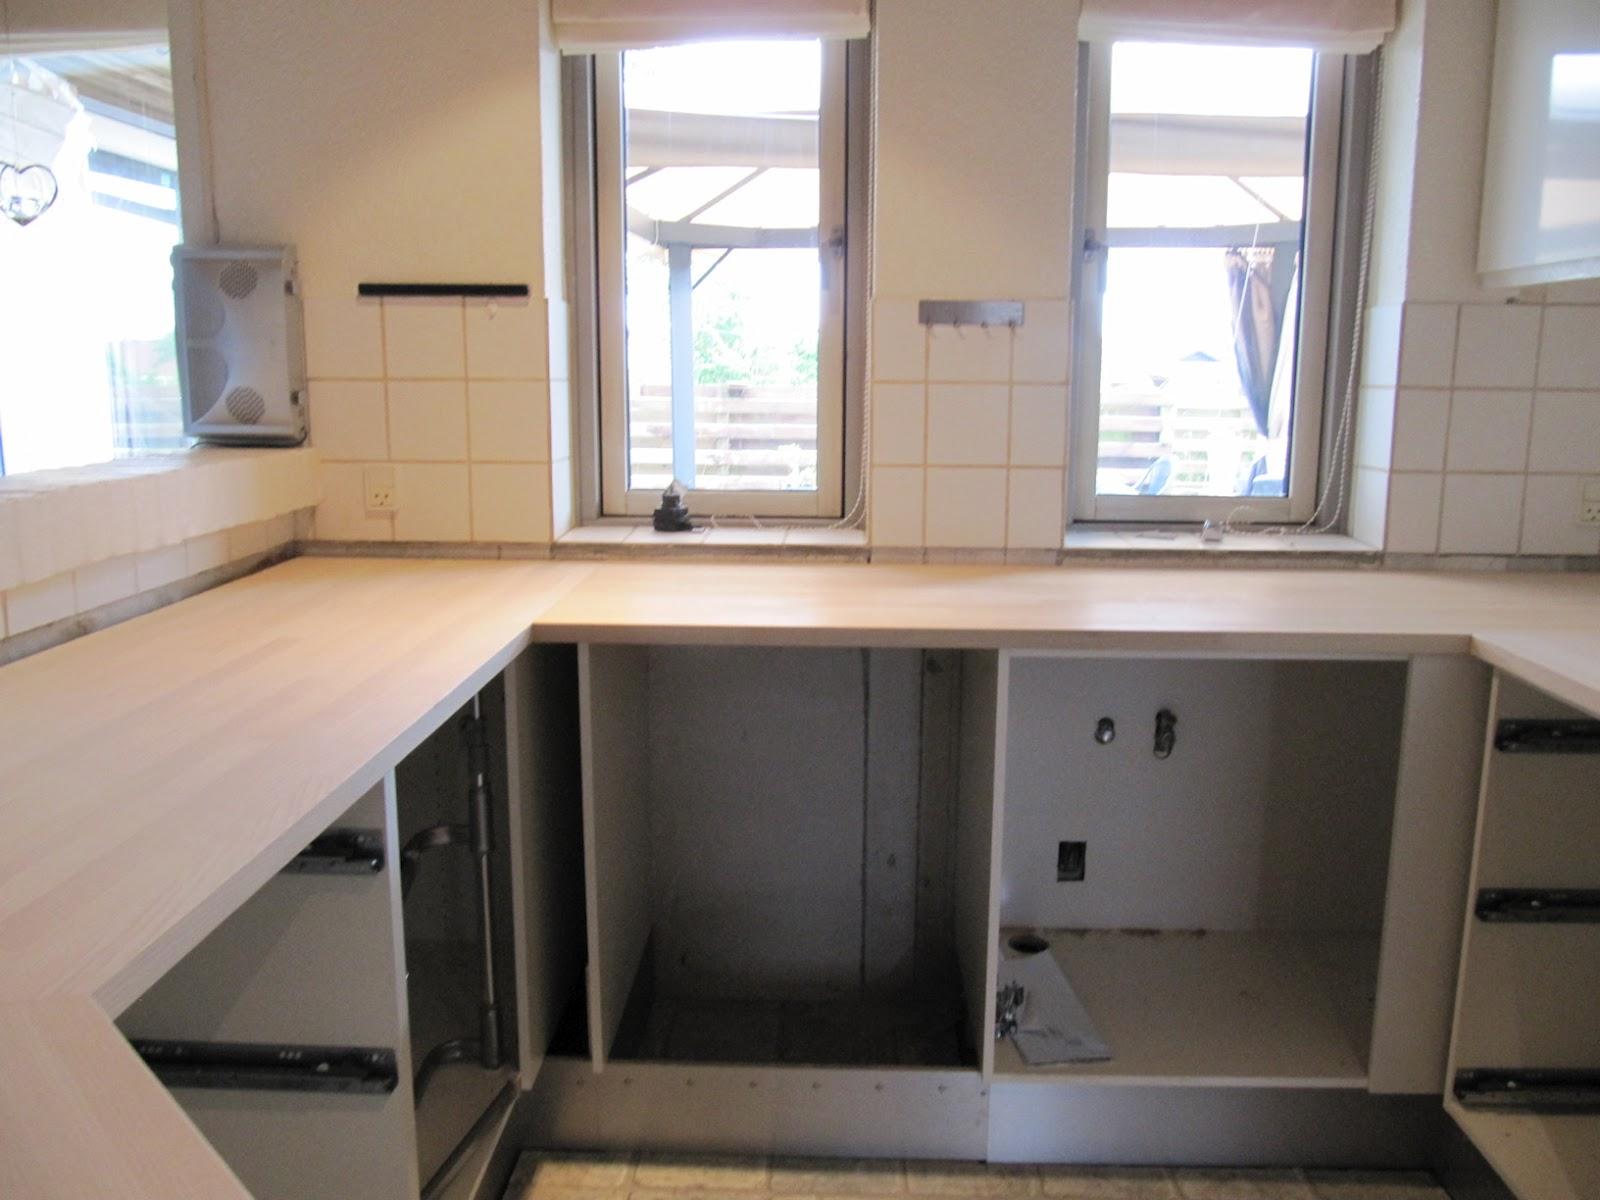 Mh design: projekt køkken